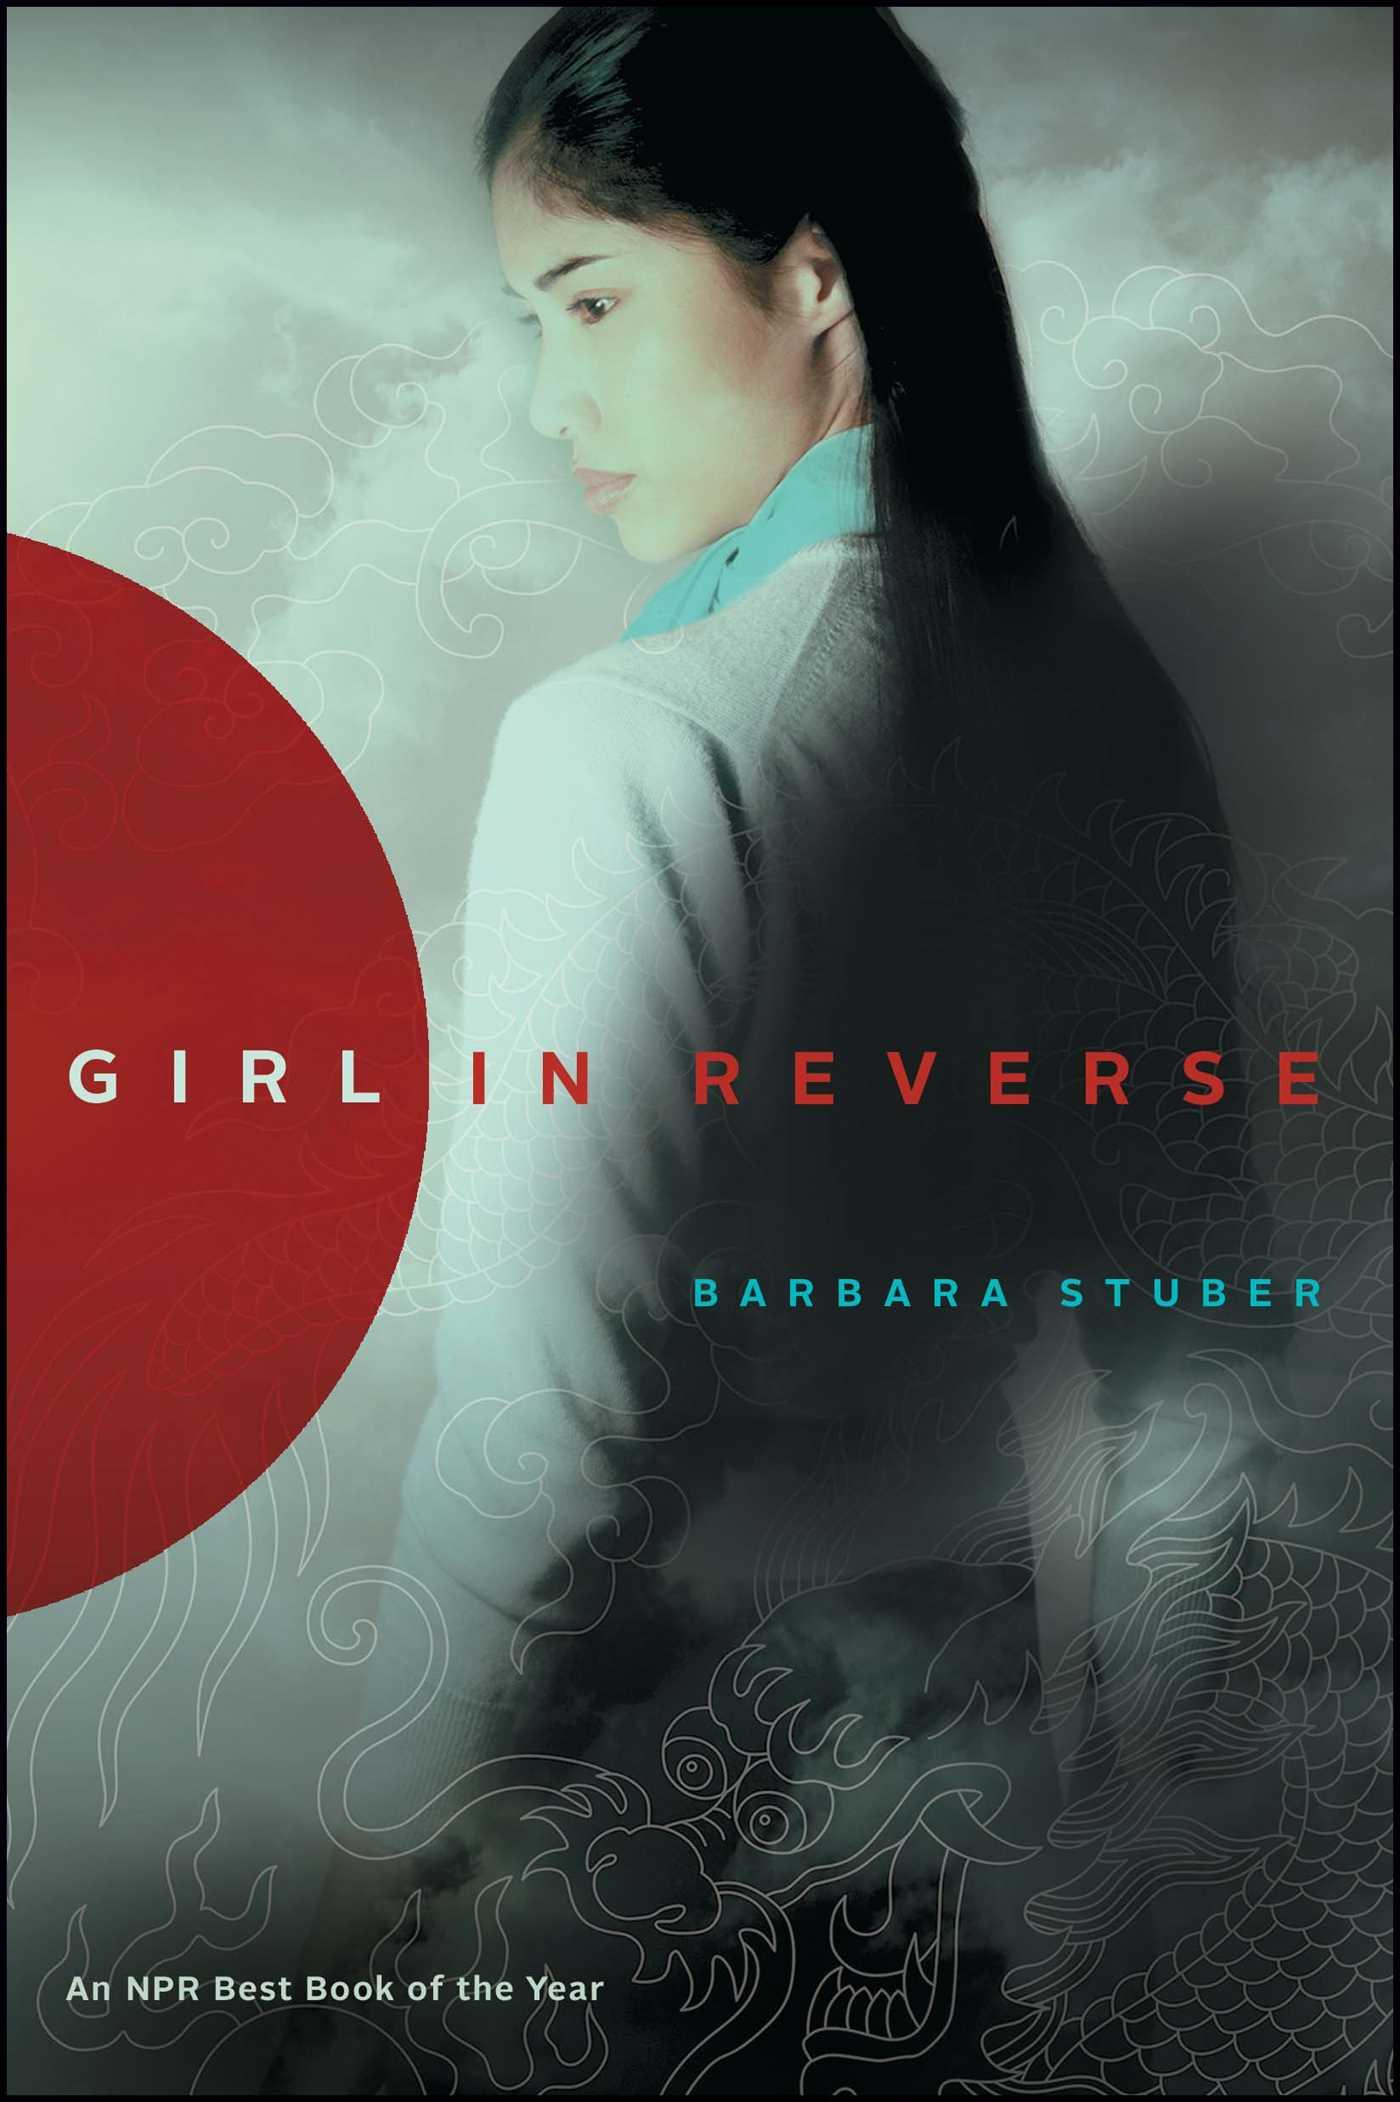 Girl in reverse 9781442497351 hr